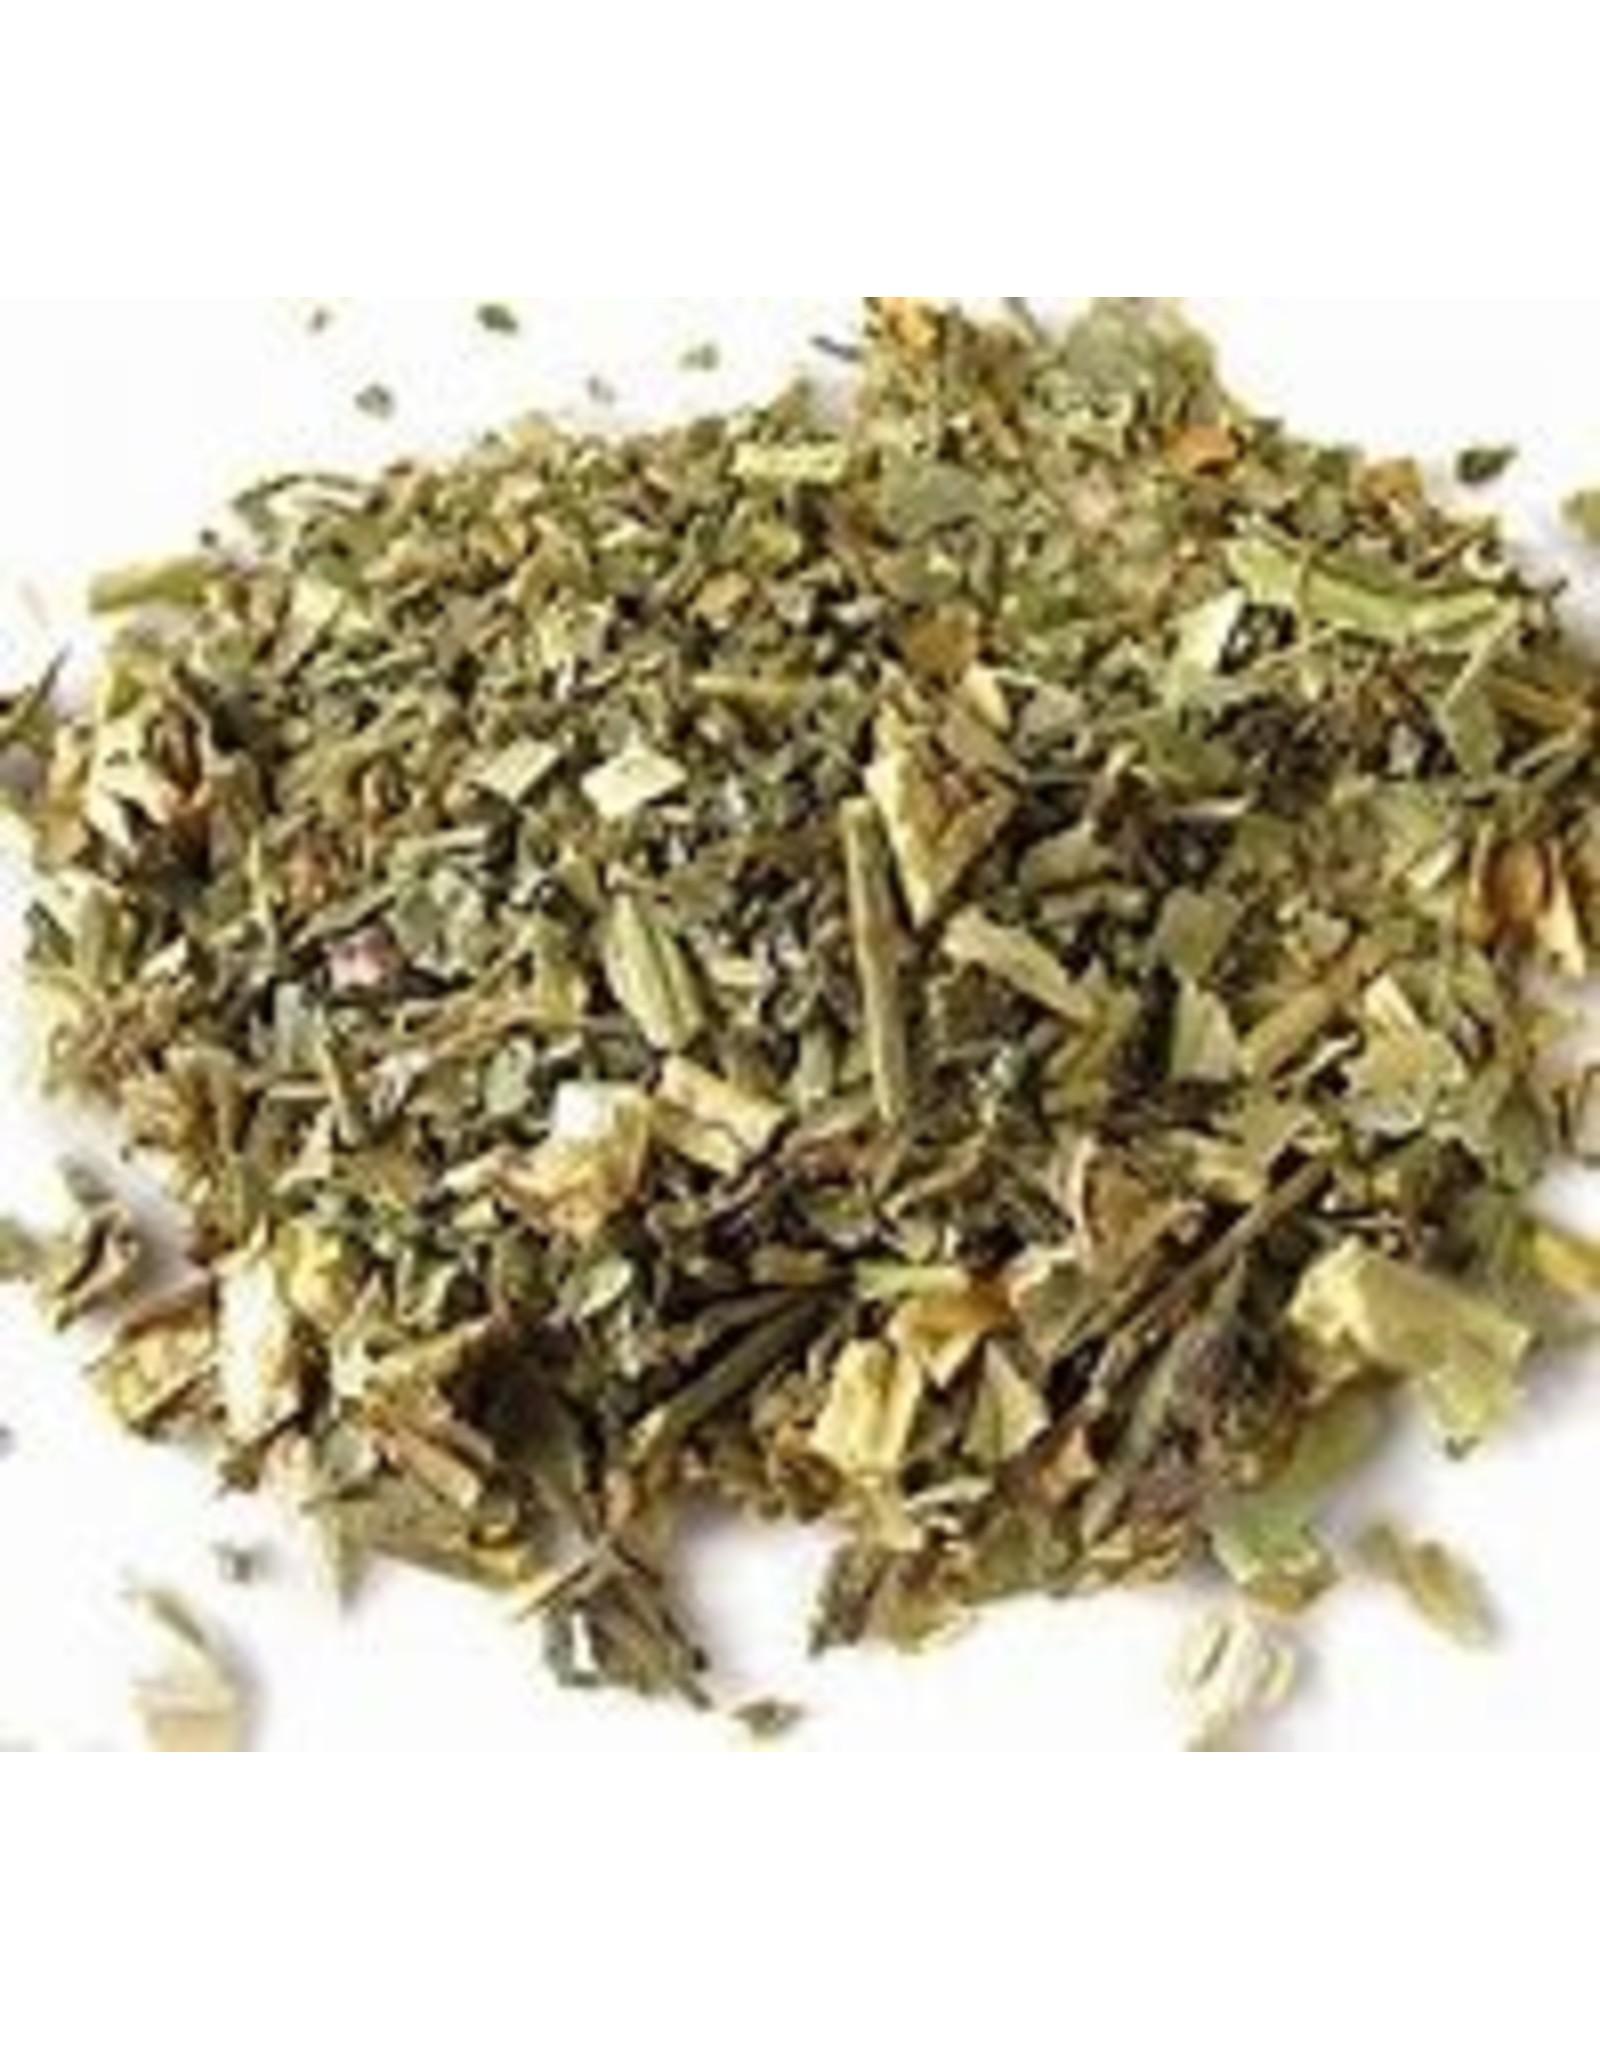 Lobelia Leaf 1 oz